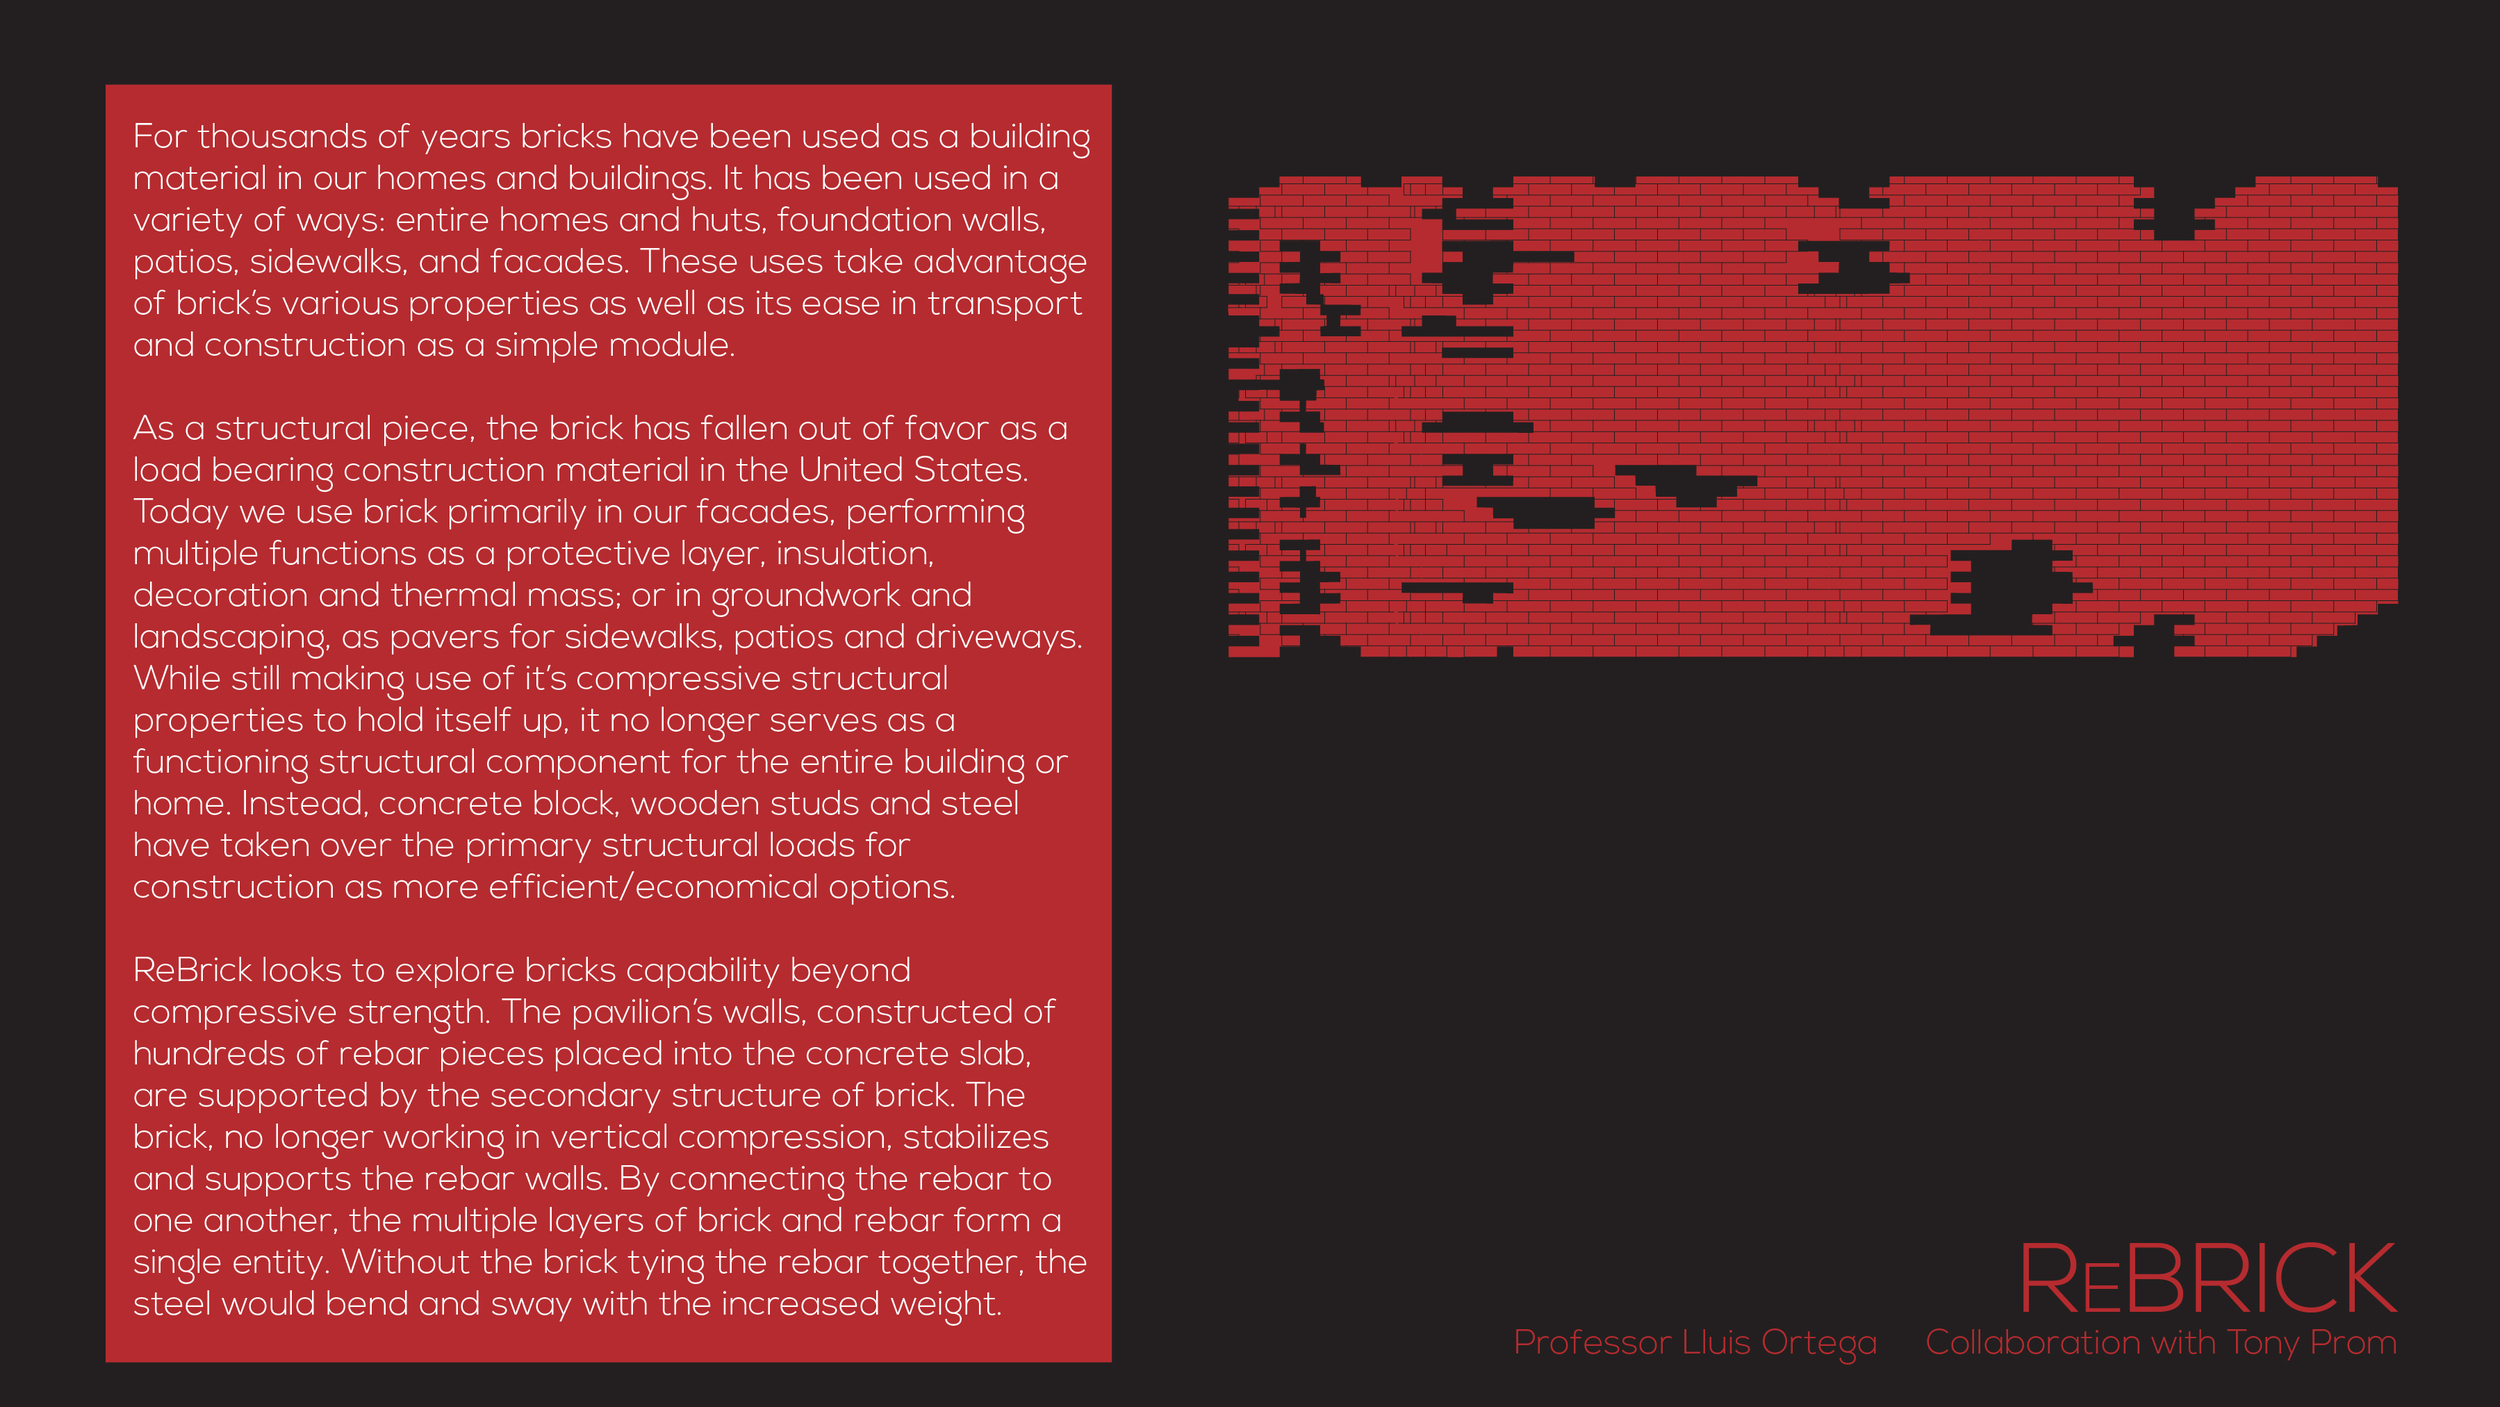 rebrick_cover-05.jpg